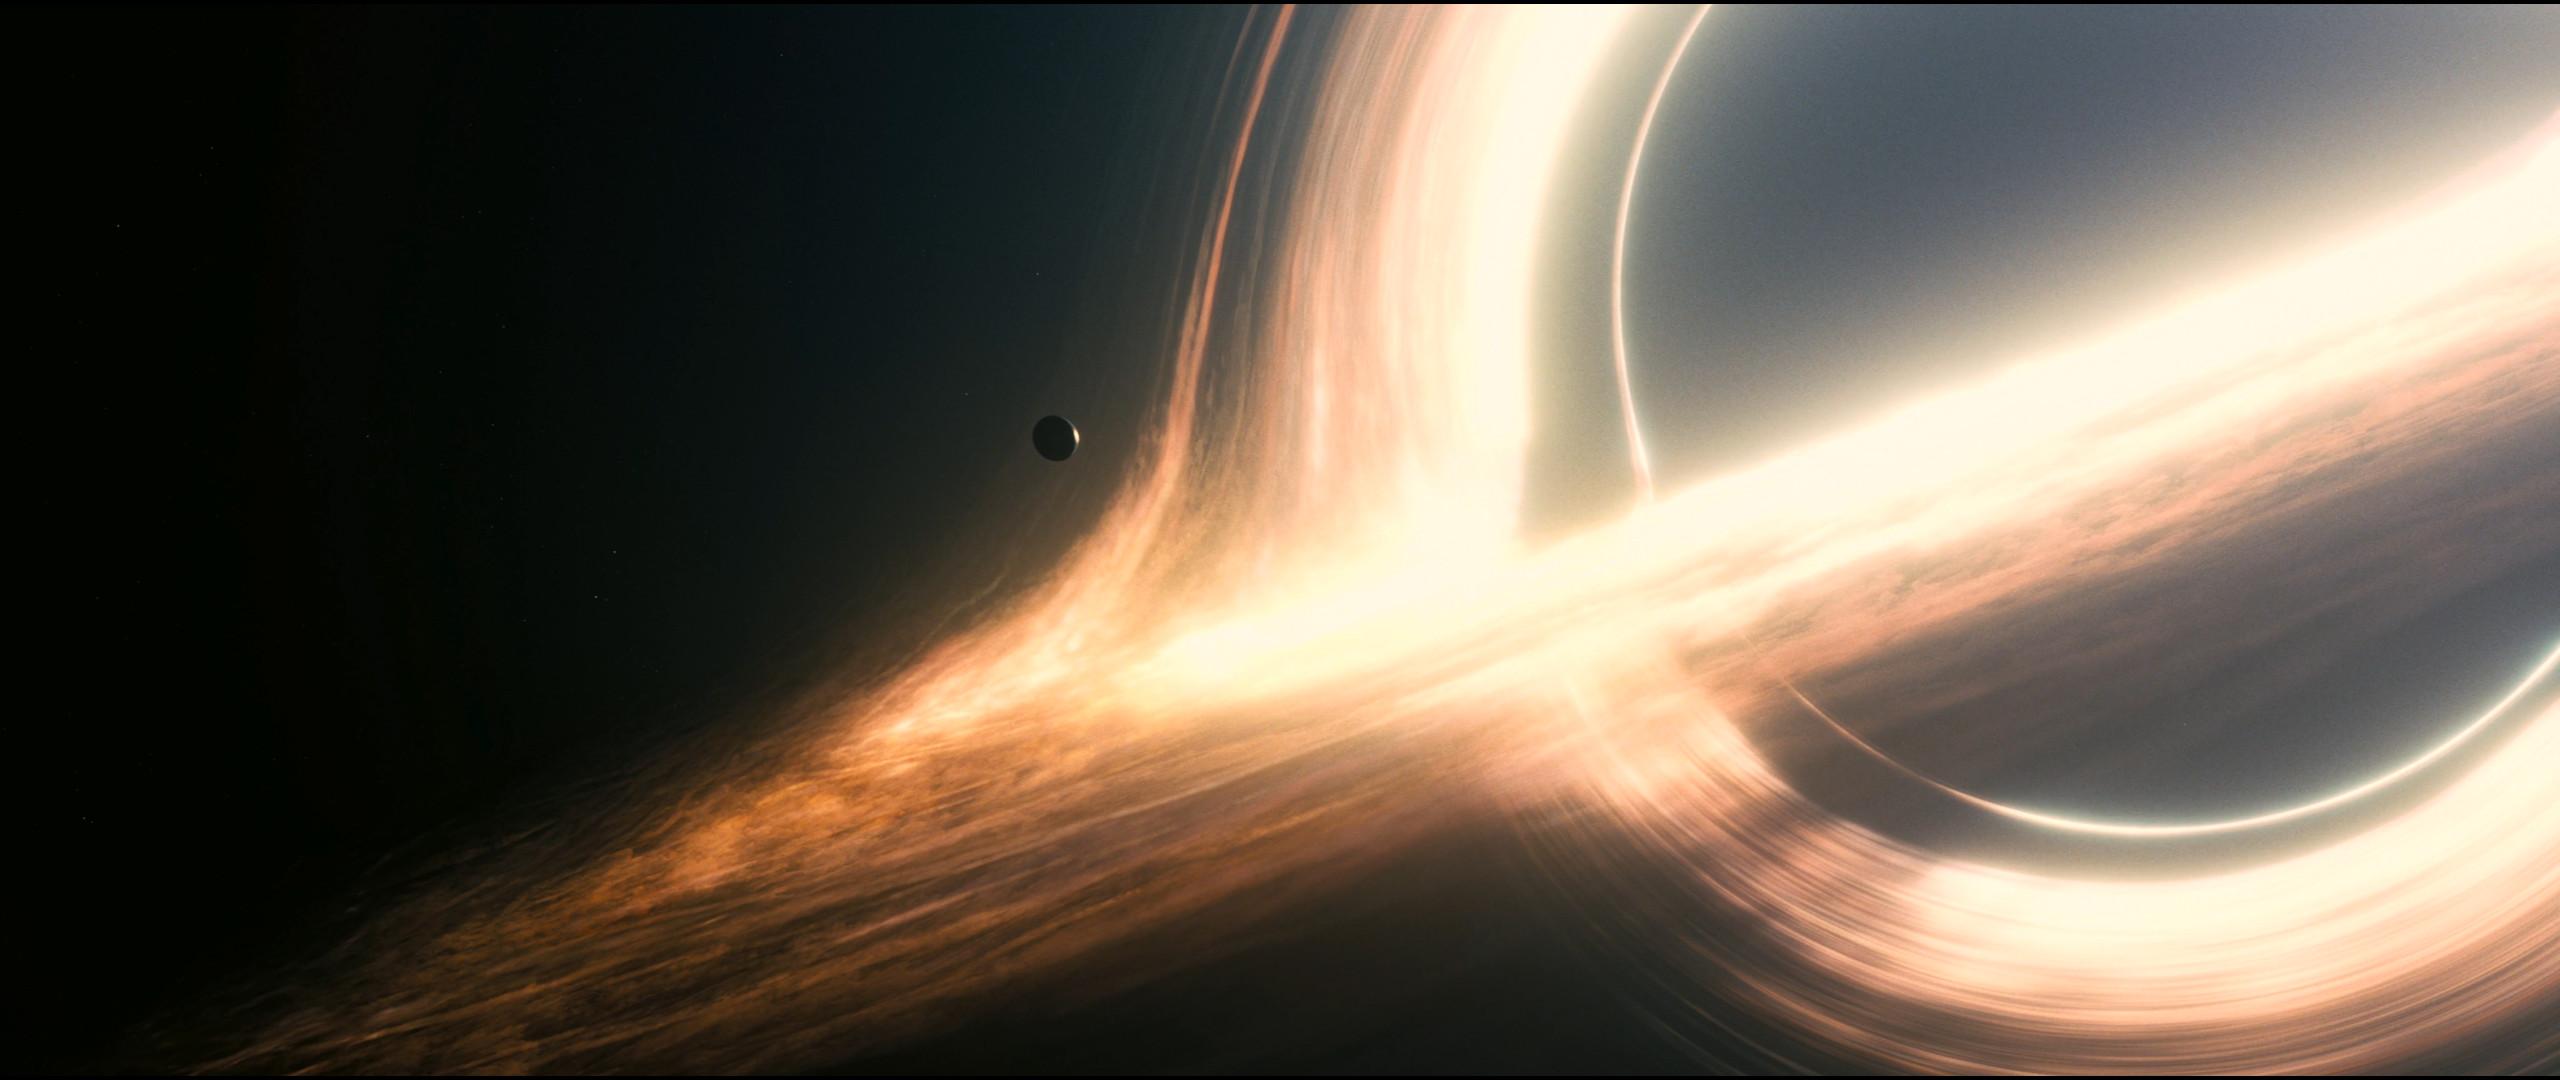 DeviantArt: More Like Interstellar Blackhole 2 Wallpaper (2560 x .